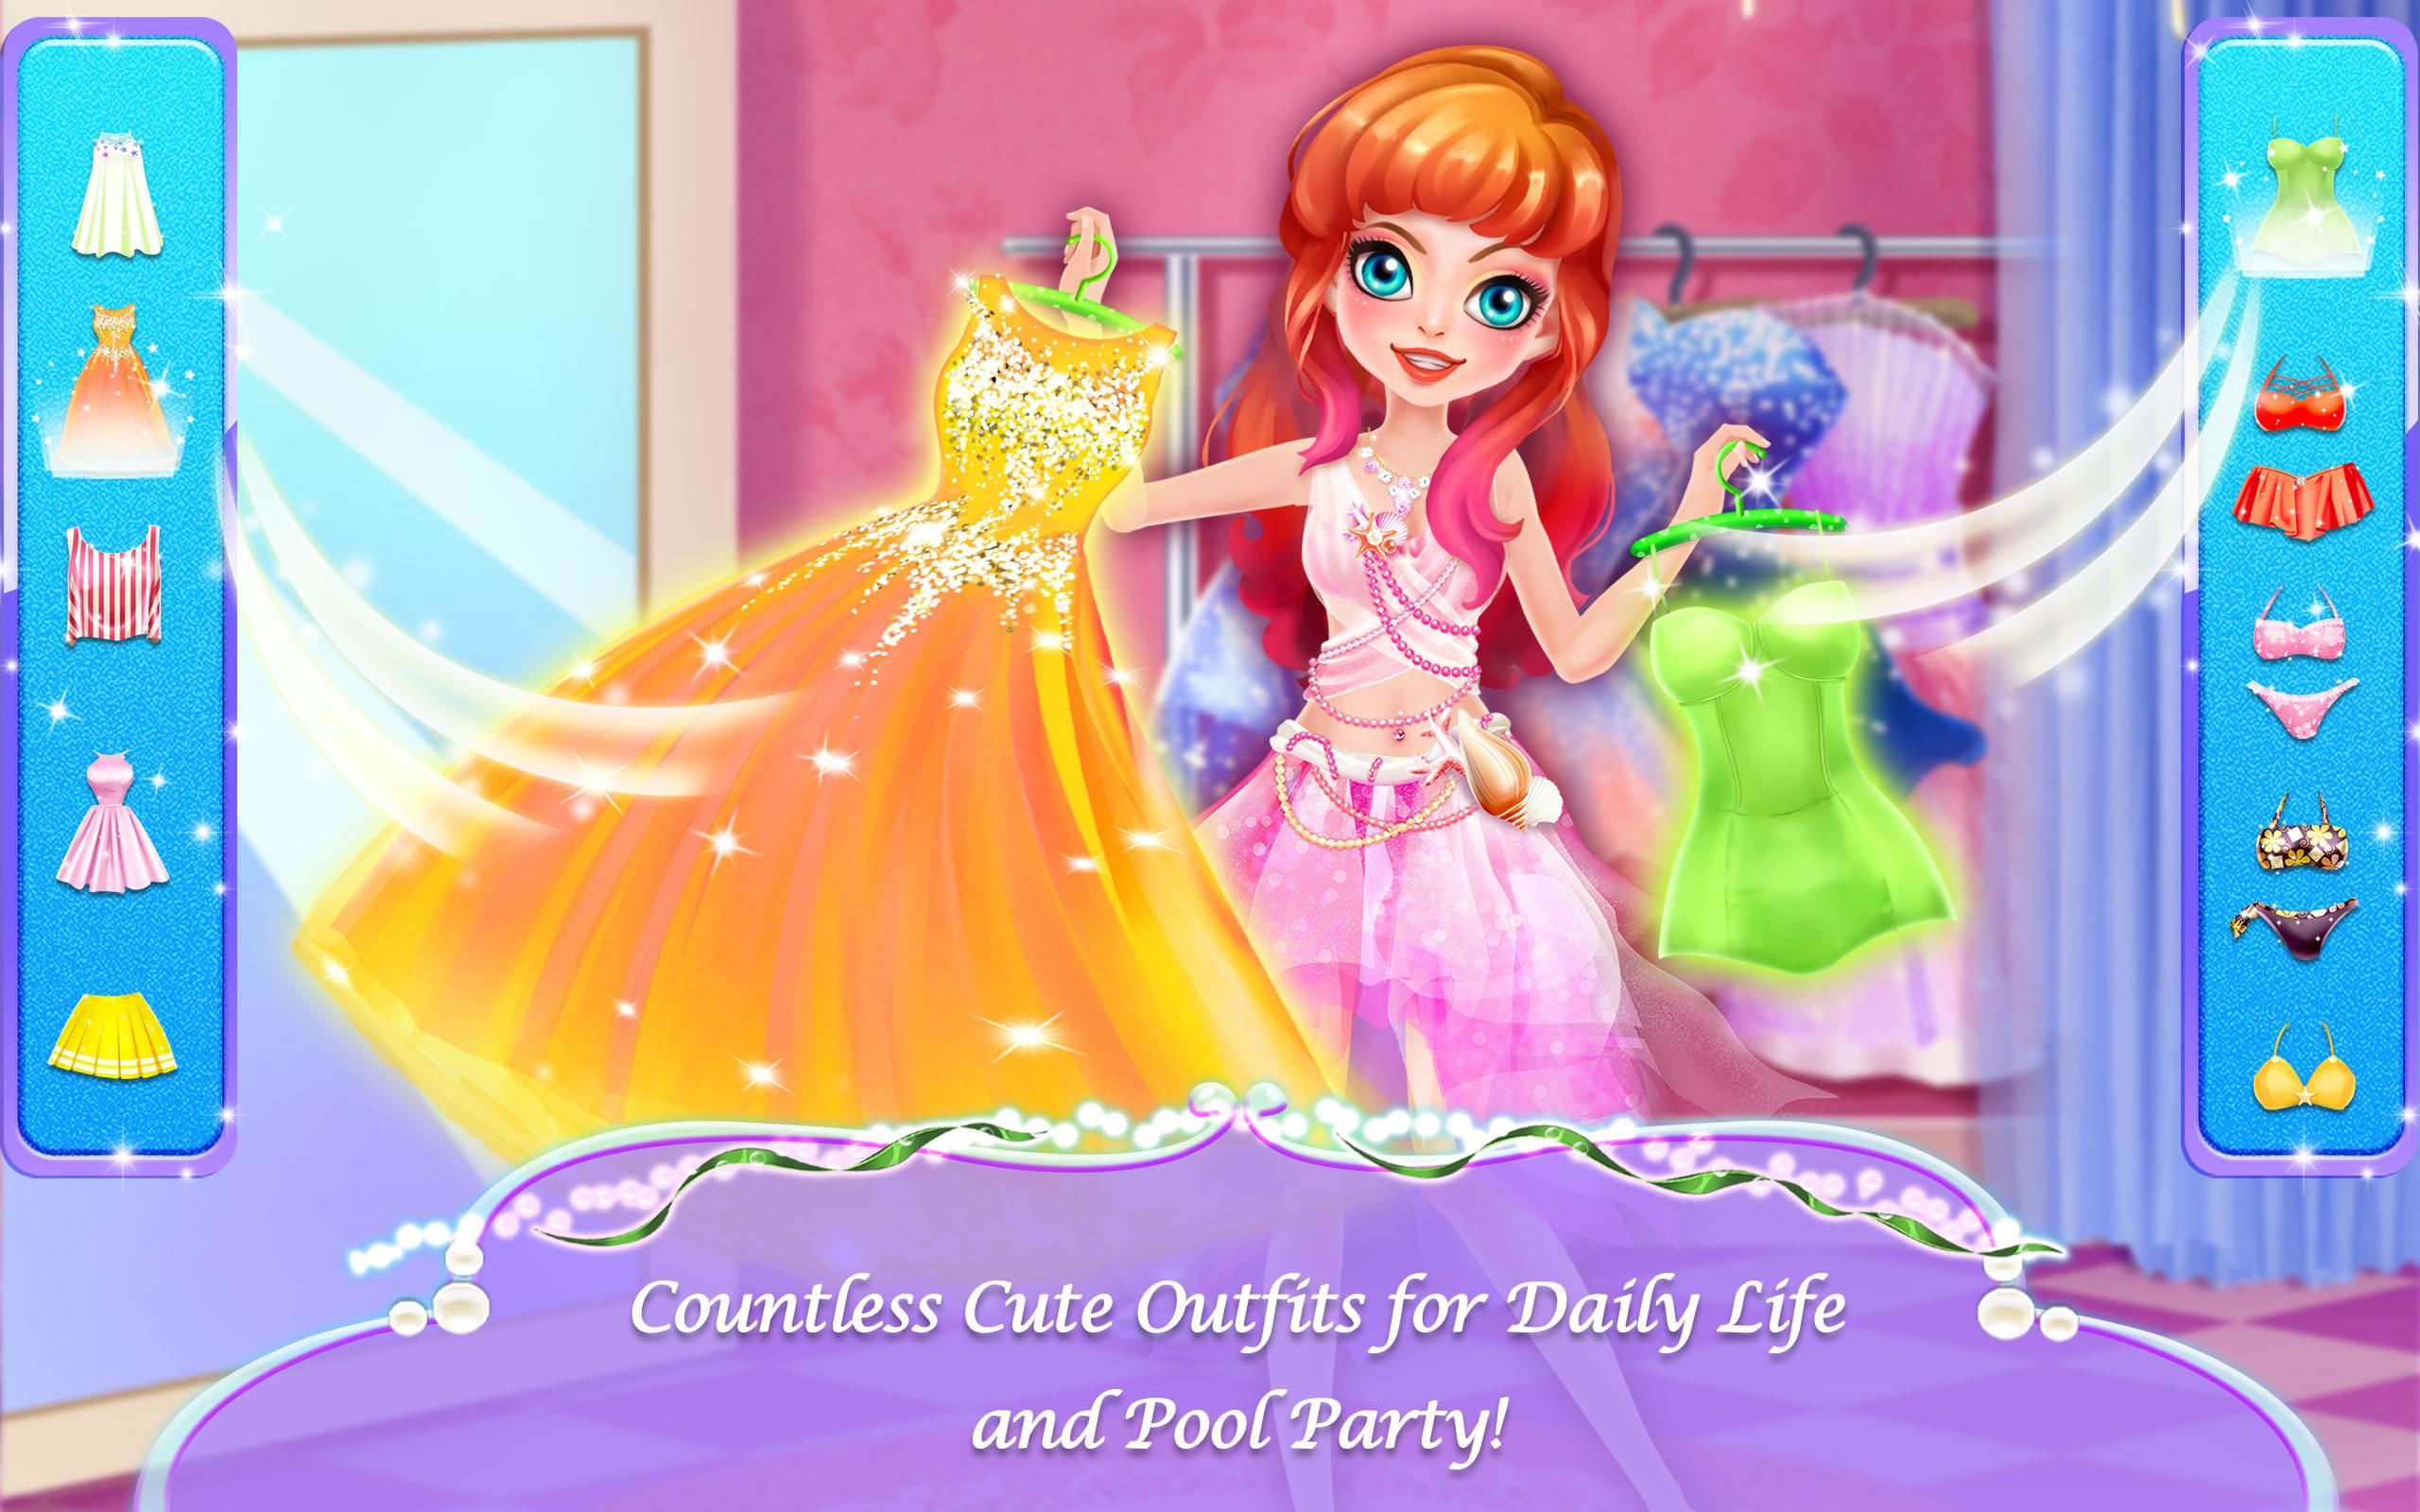 Mermaid Princess Love Story Dress Up & Salon Game